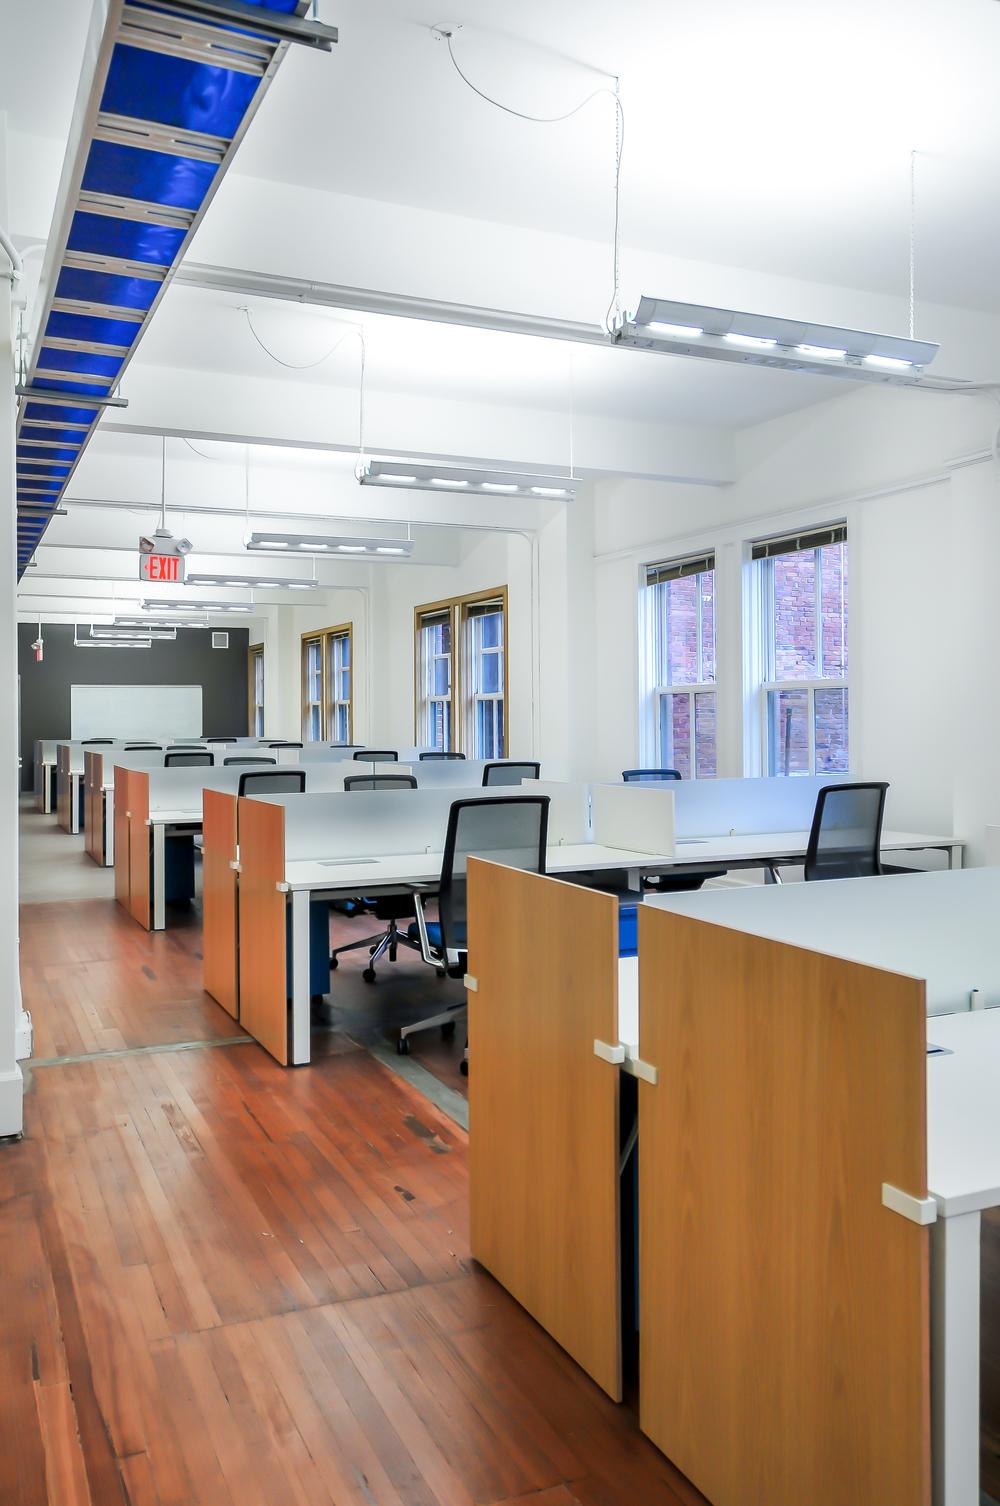 20140423-Gastown Office (11 of 21).jpg